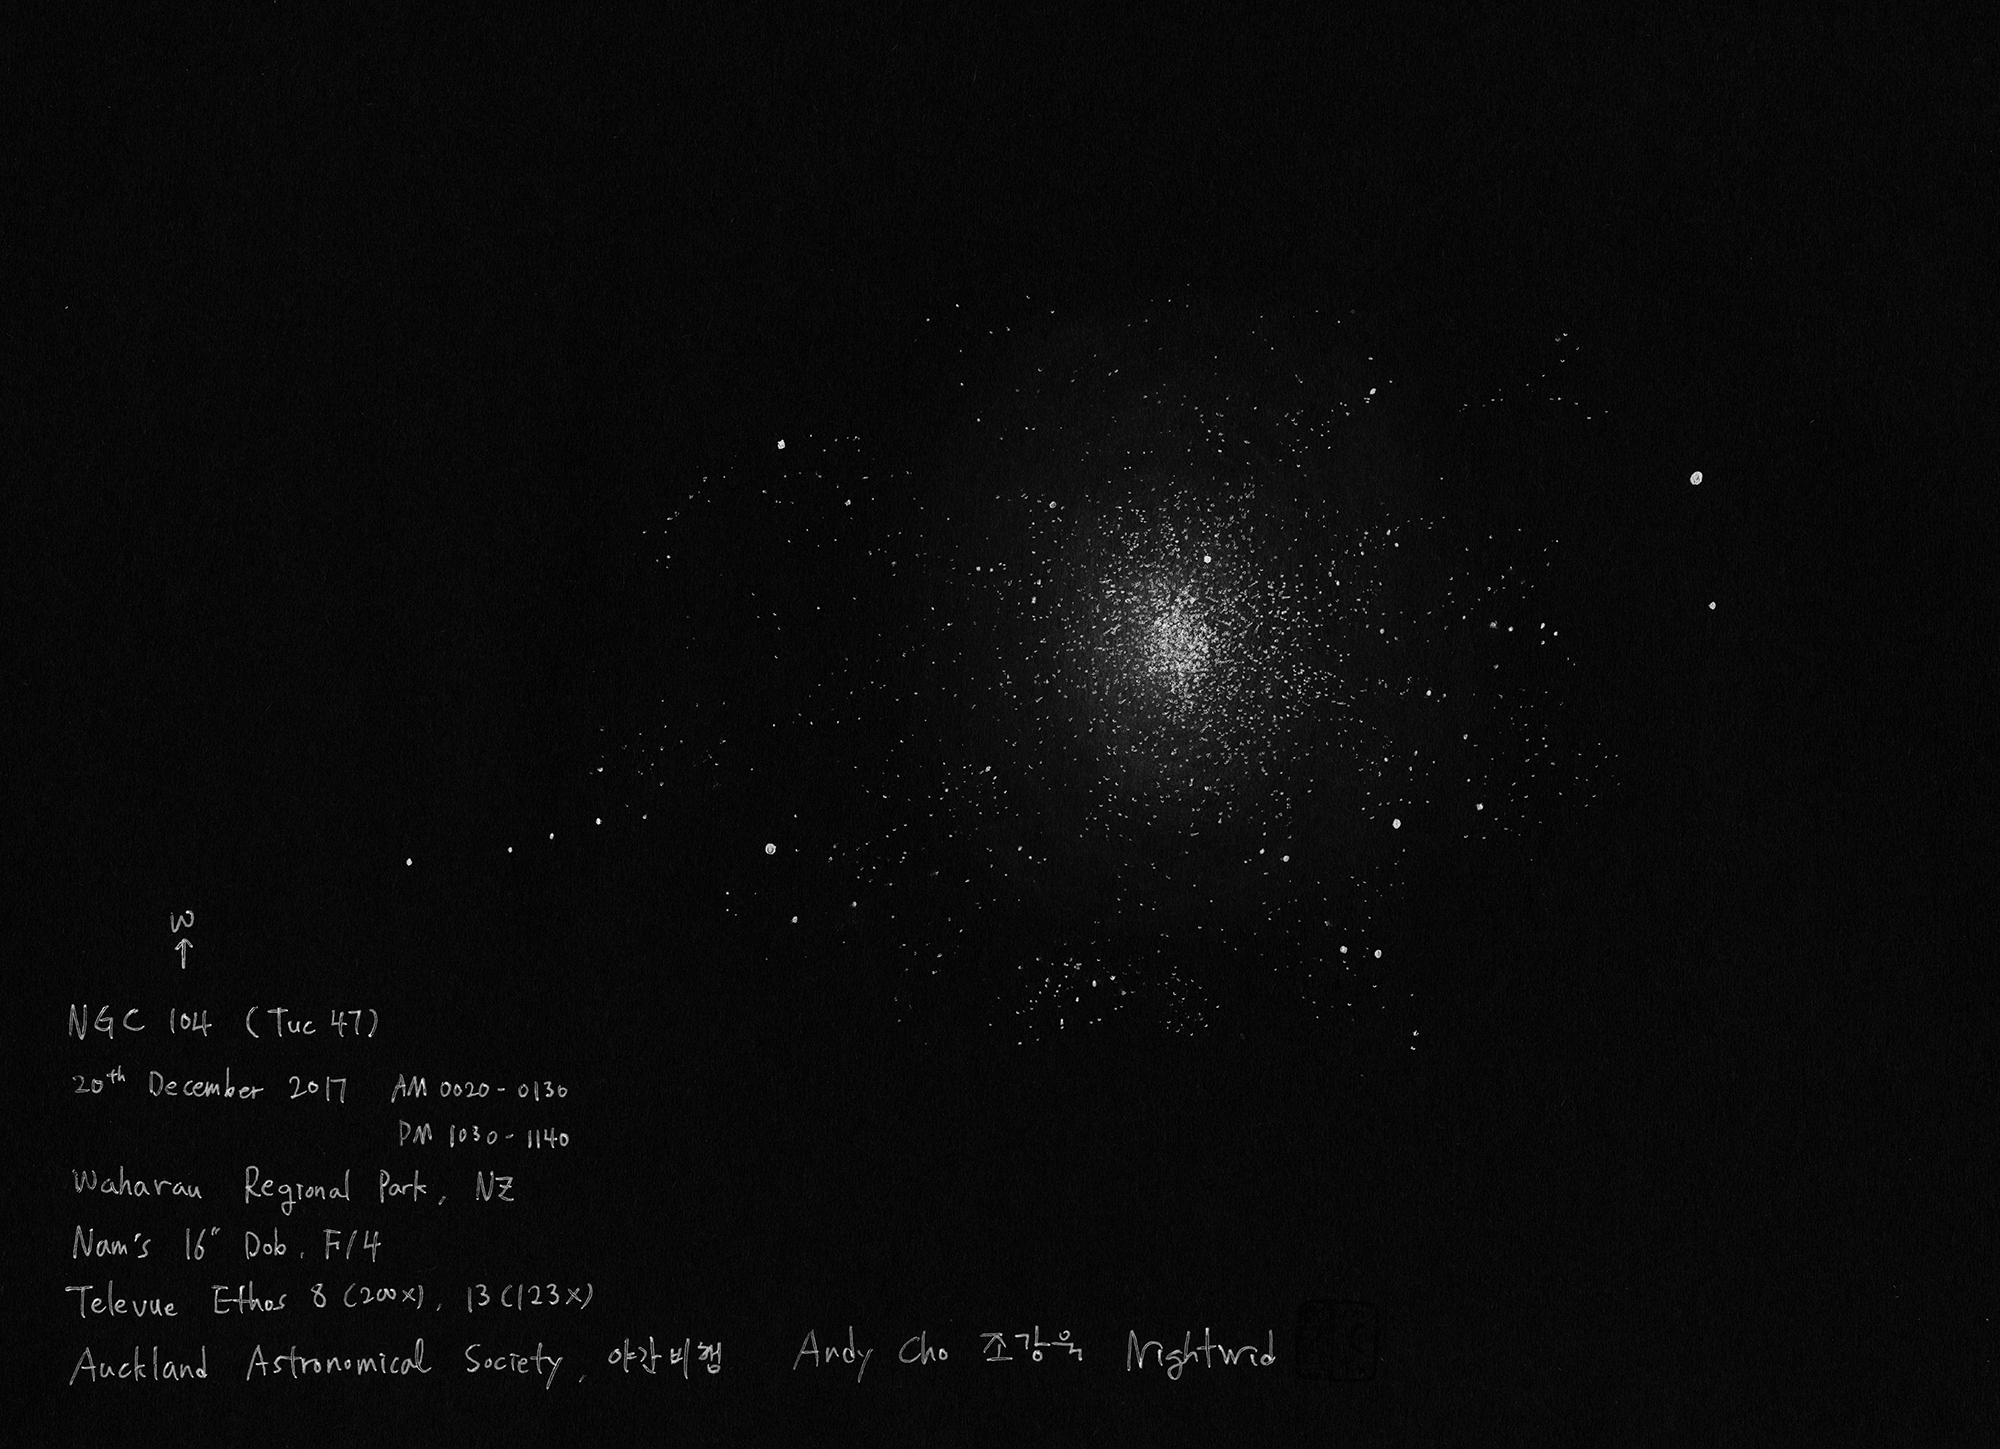 NGC104_20Dec17_2000.jpg